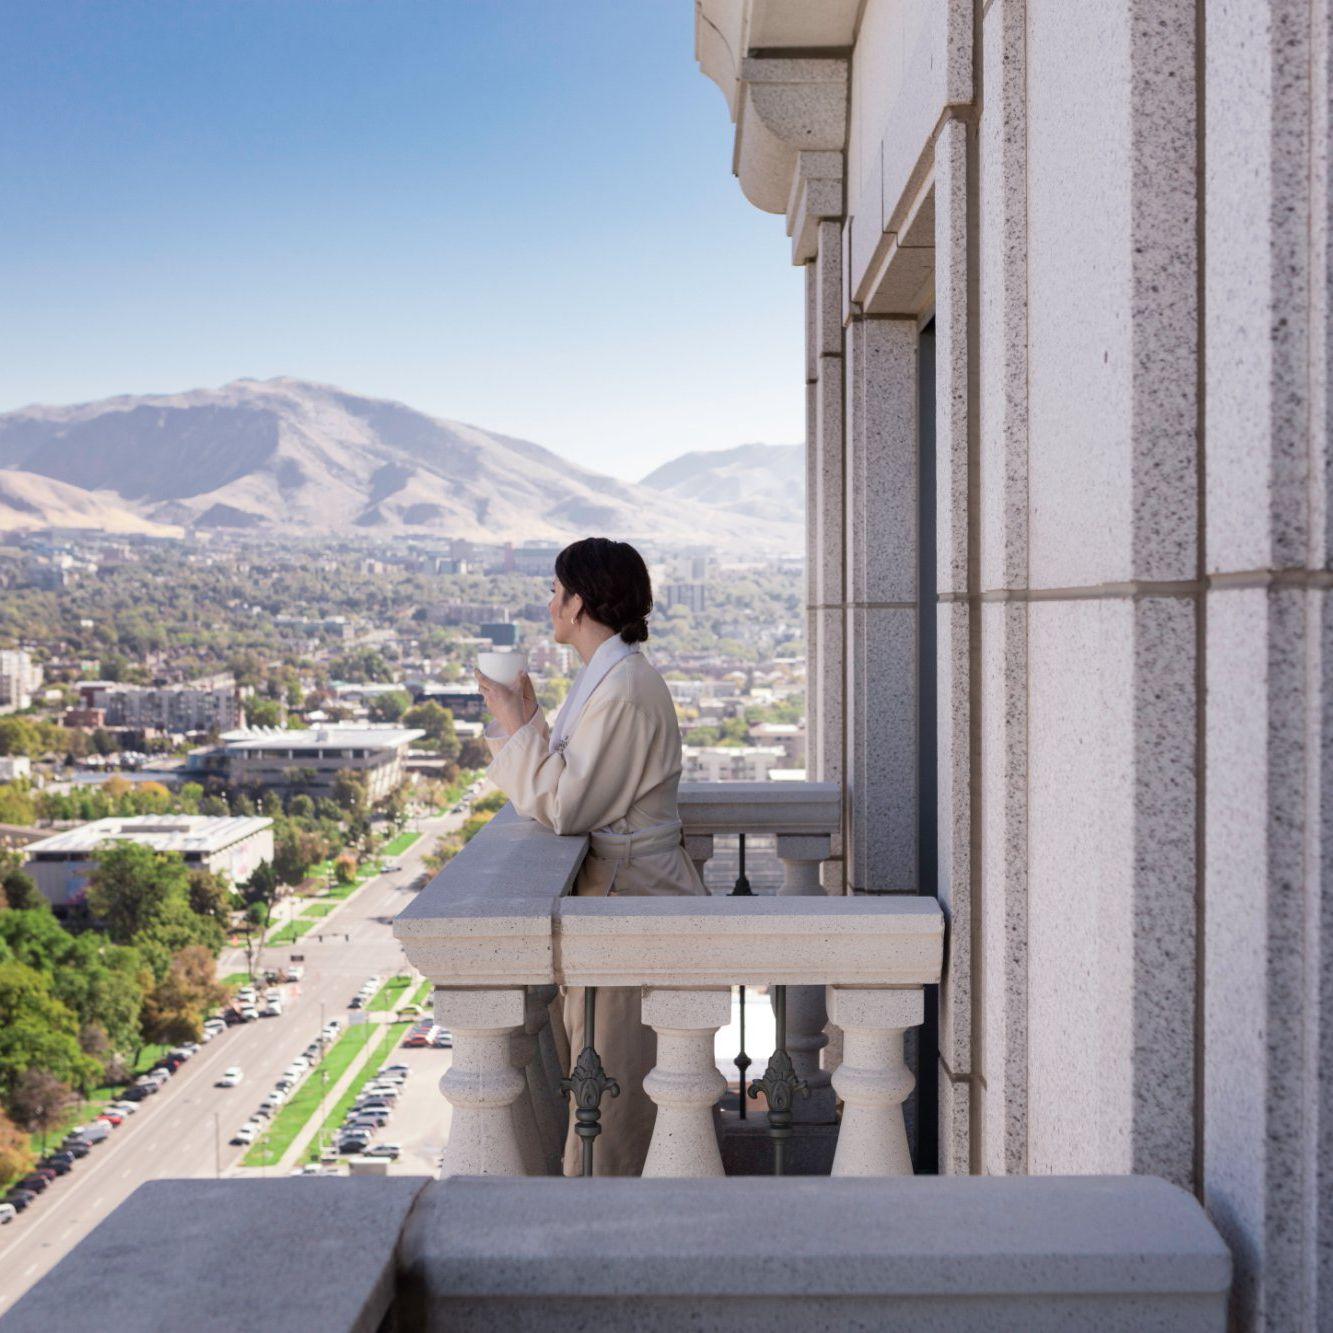 The 9 Best Salt Lake City Hotels of 2019